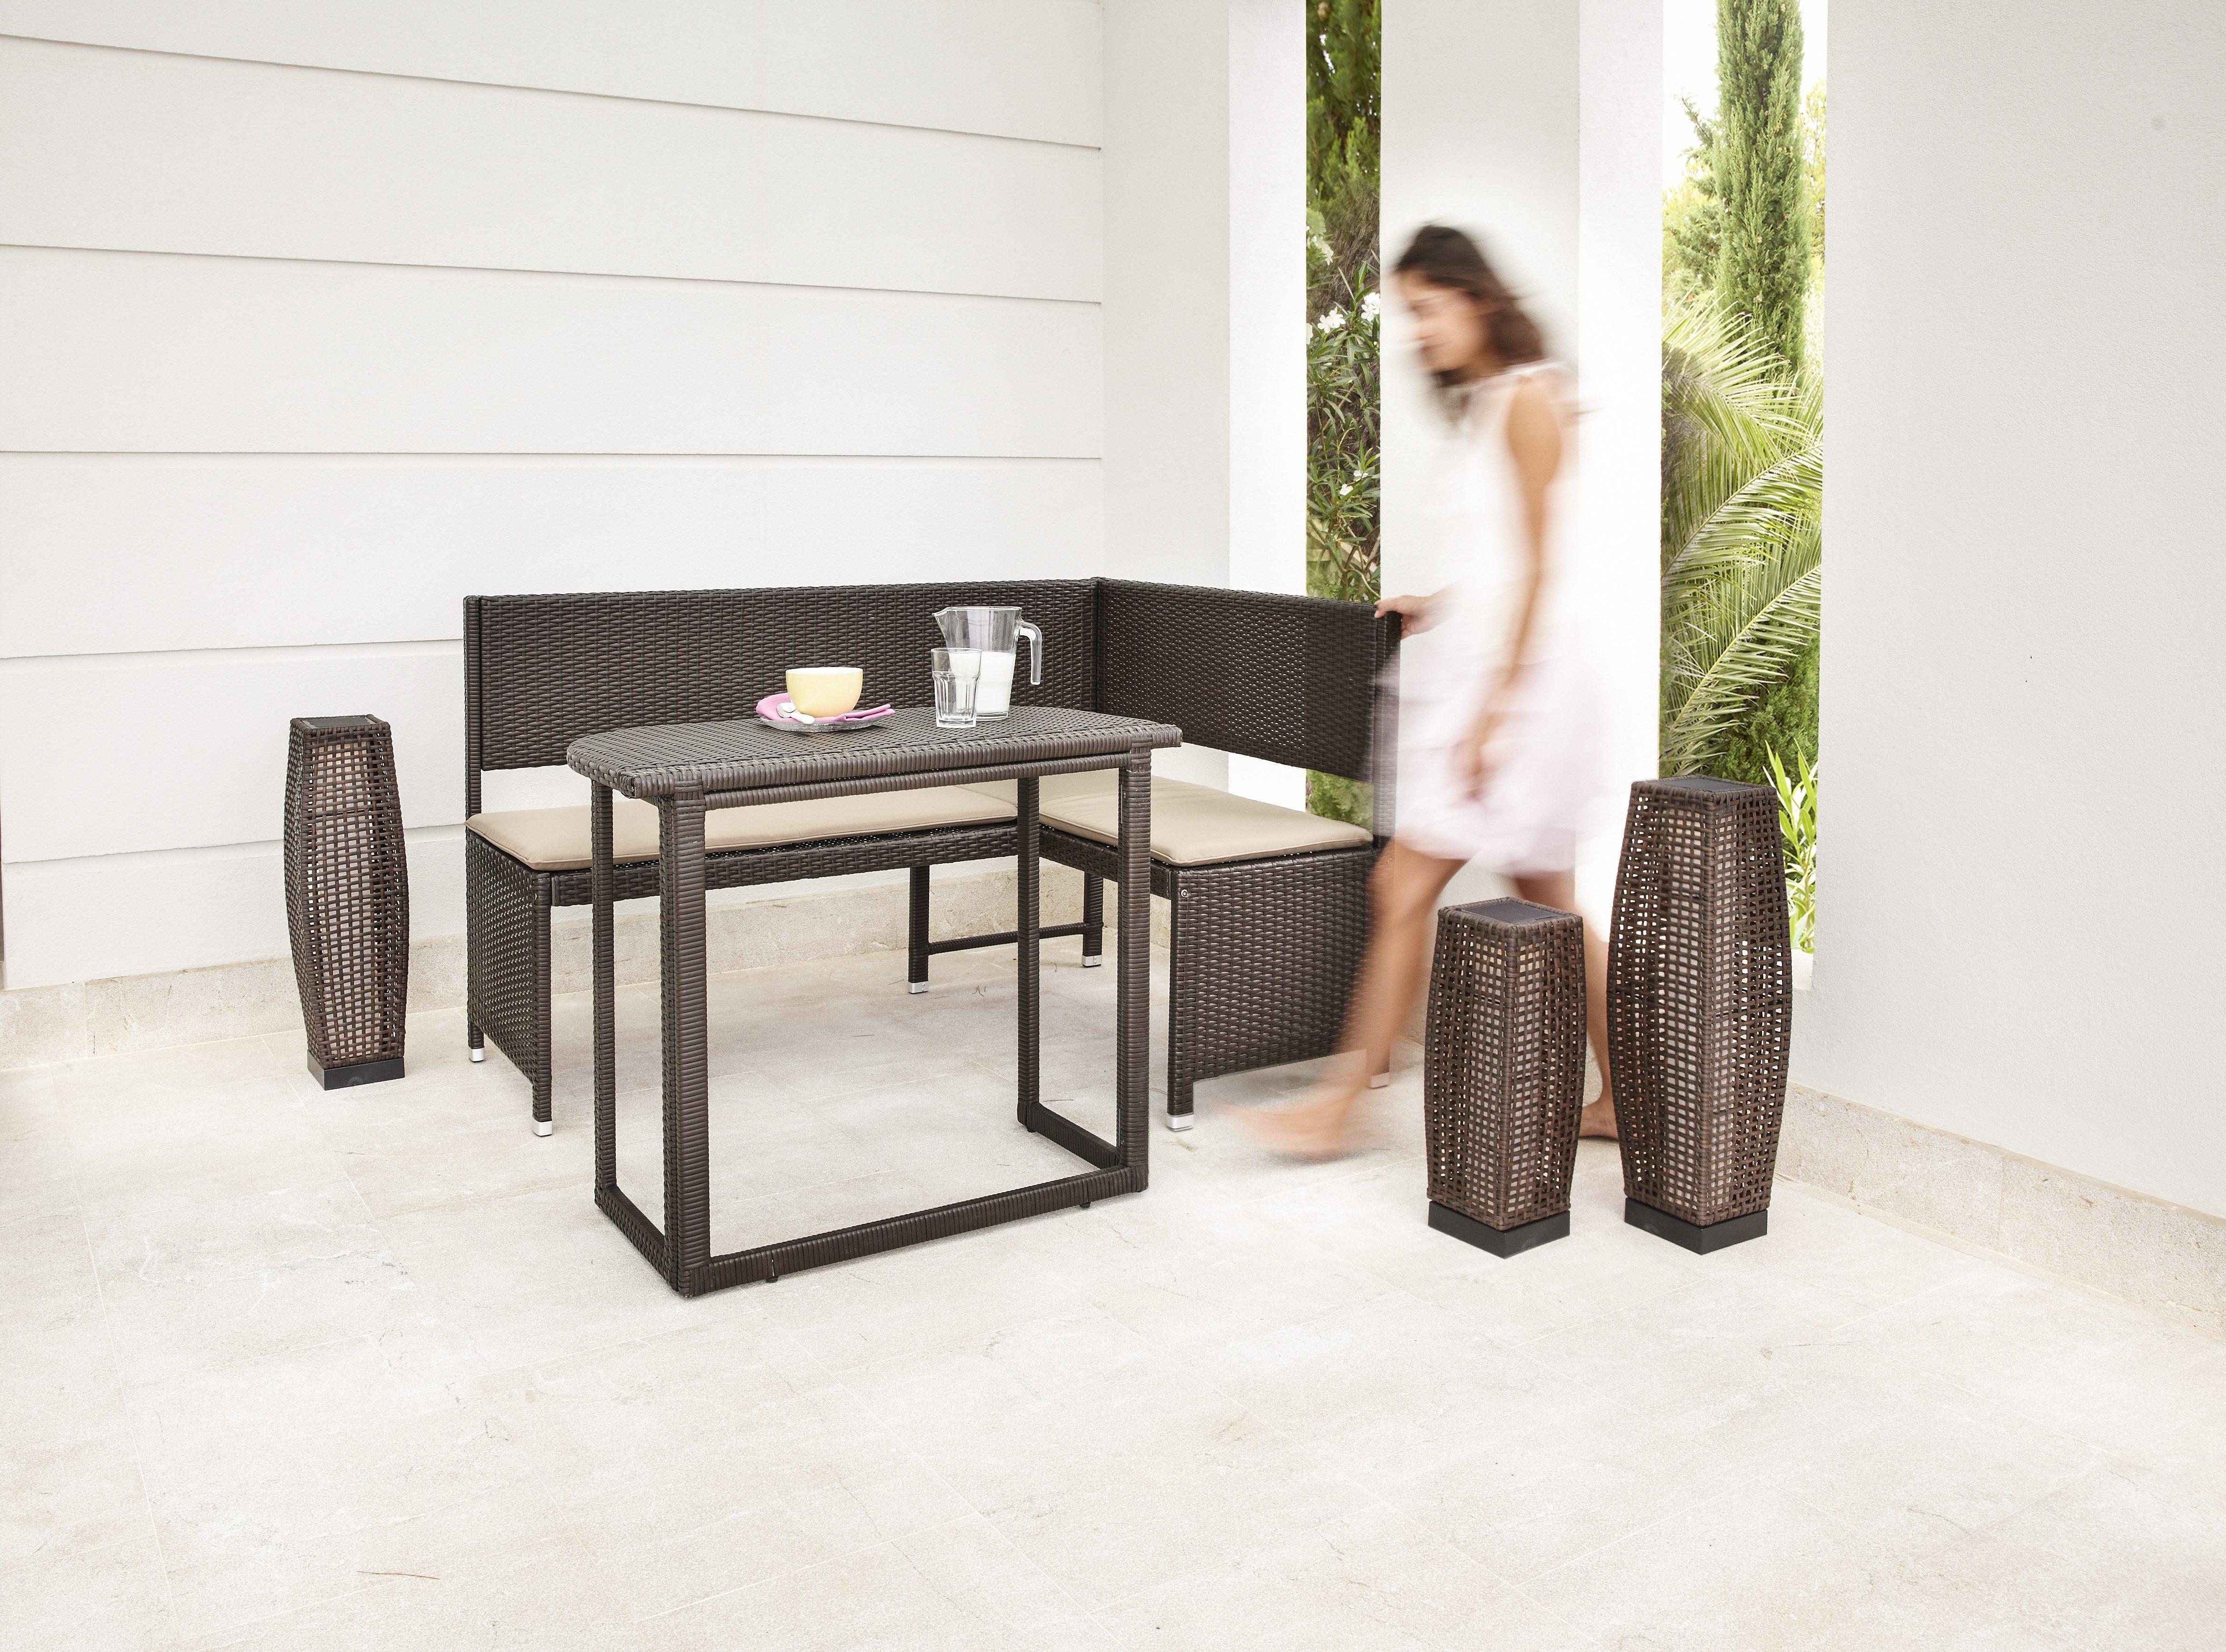 Gartenmöbelset »Rattan«, 4-tgl., Eckbank, Tisch90x50 cm, Polyrattan, braun